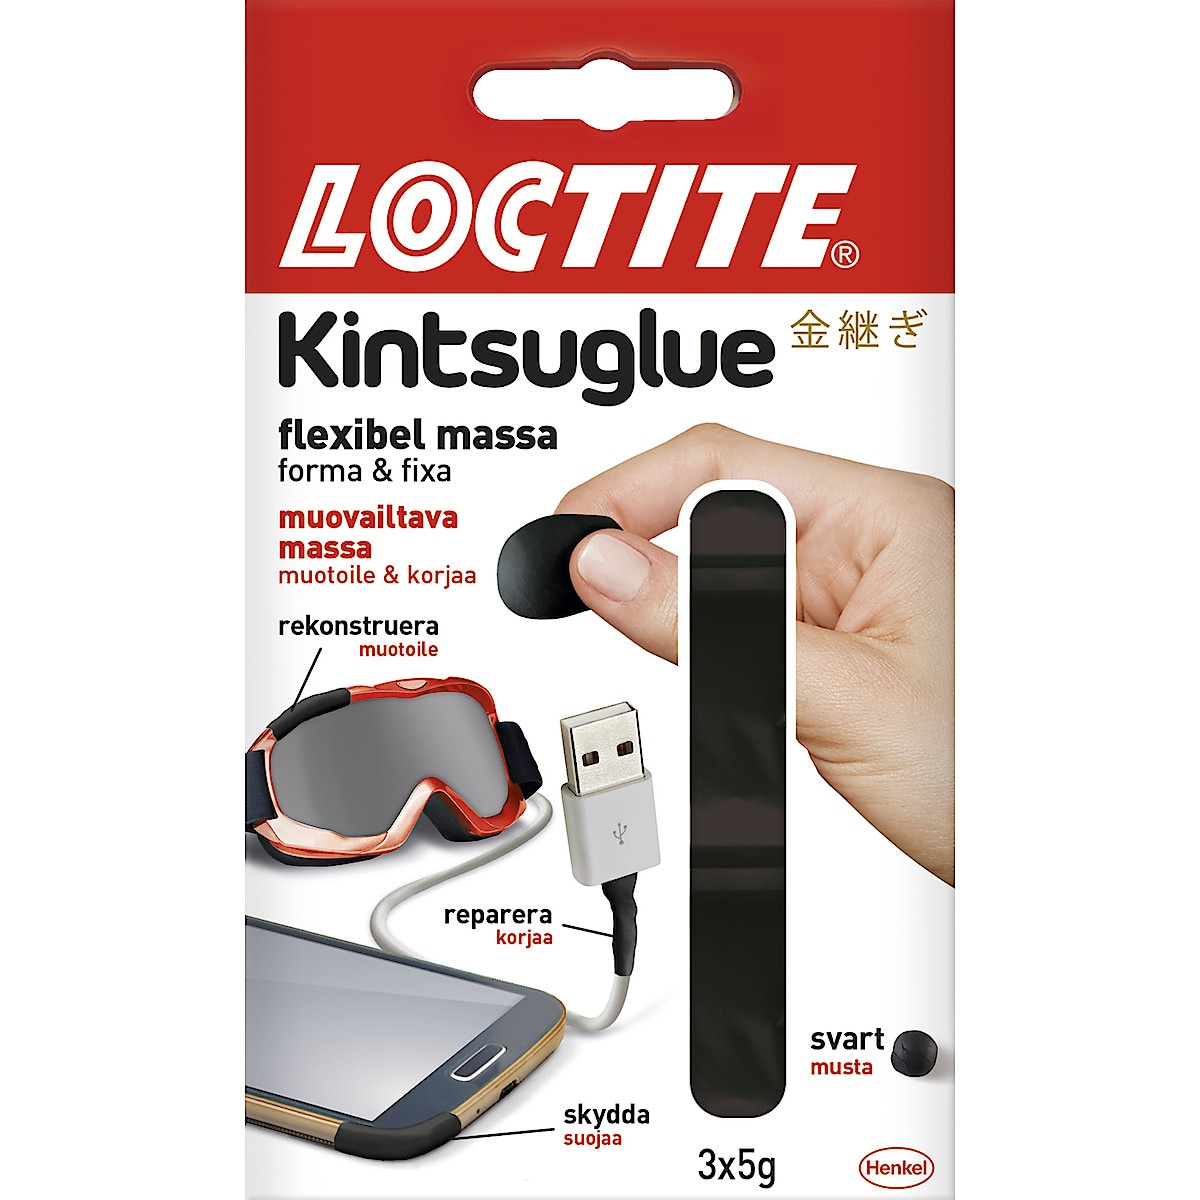 Reparationsmassa Loctite Kintsuglue